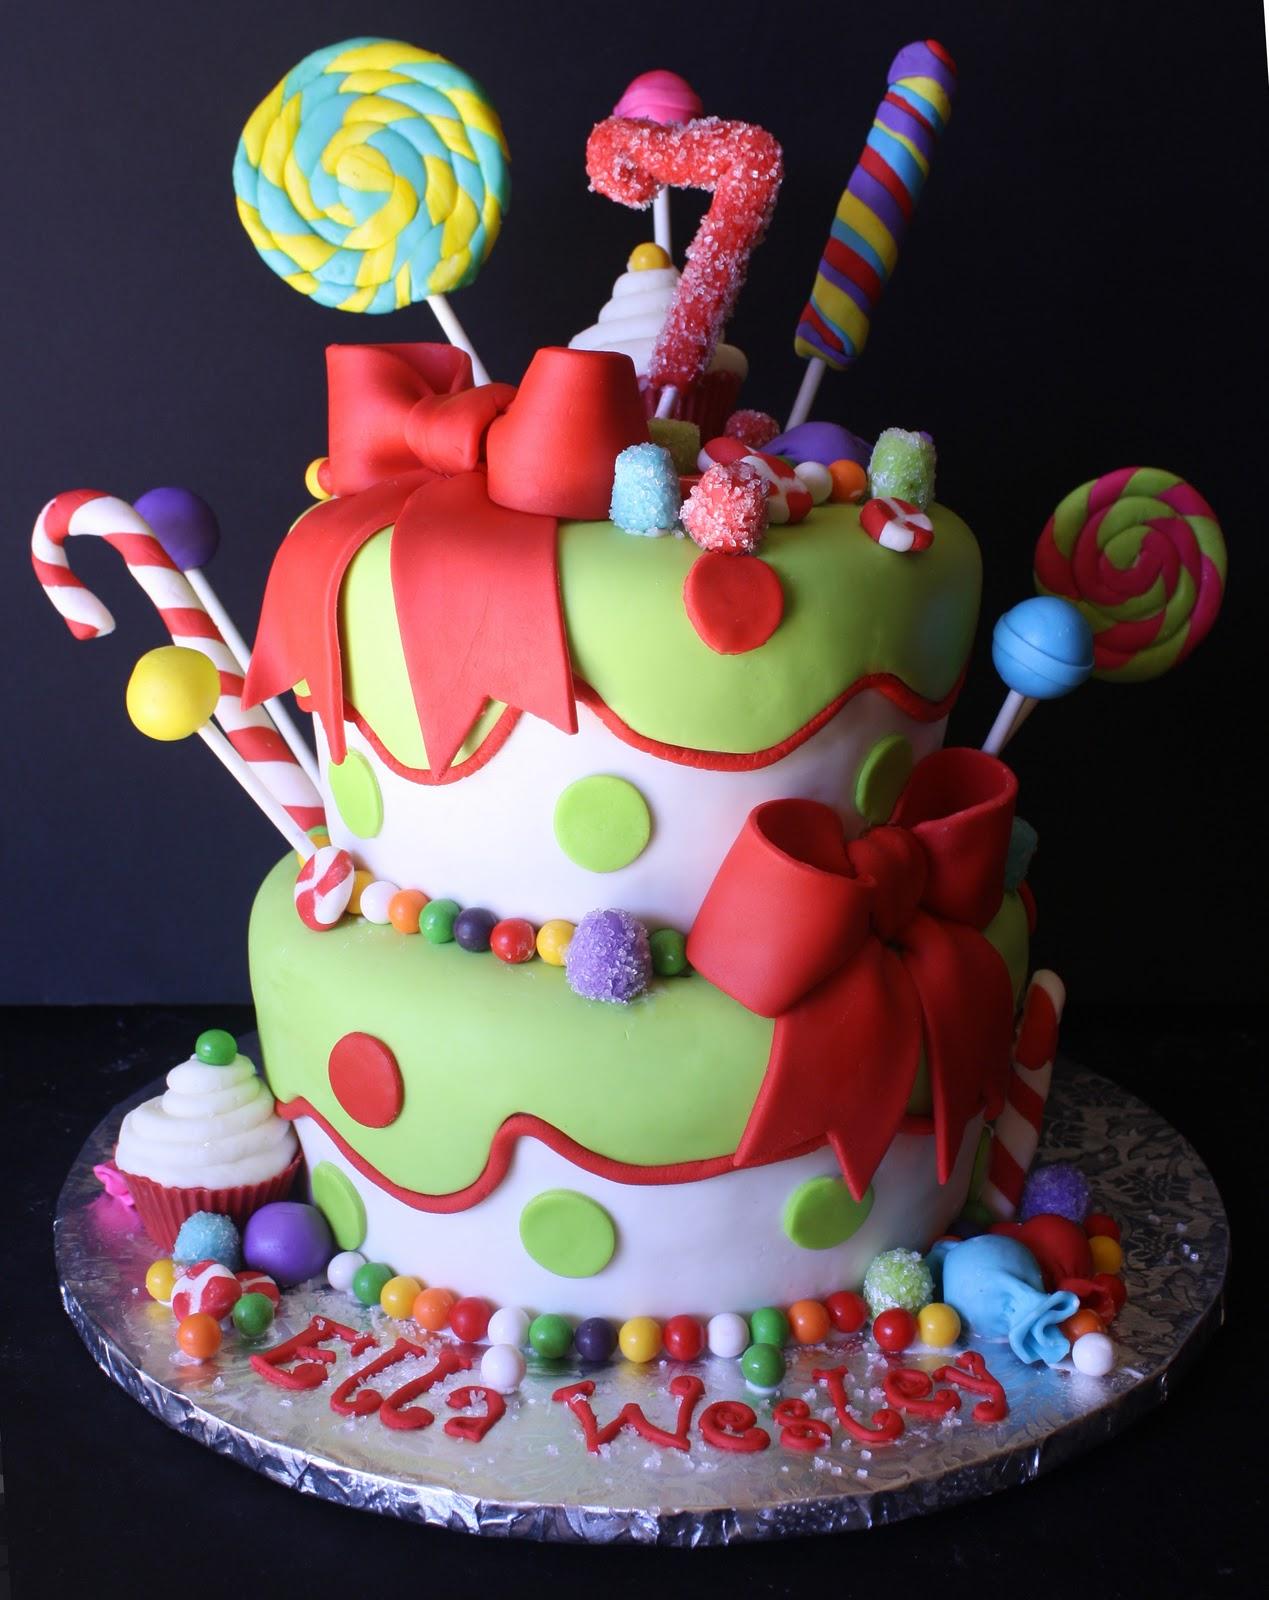 Christmas Birthday Cake Images : christmas birthday cakes MEMES